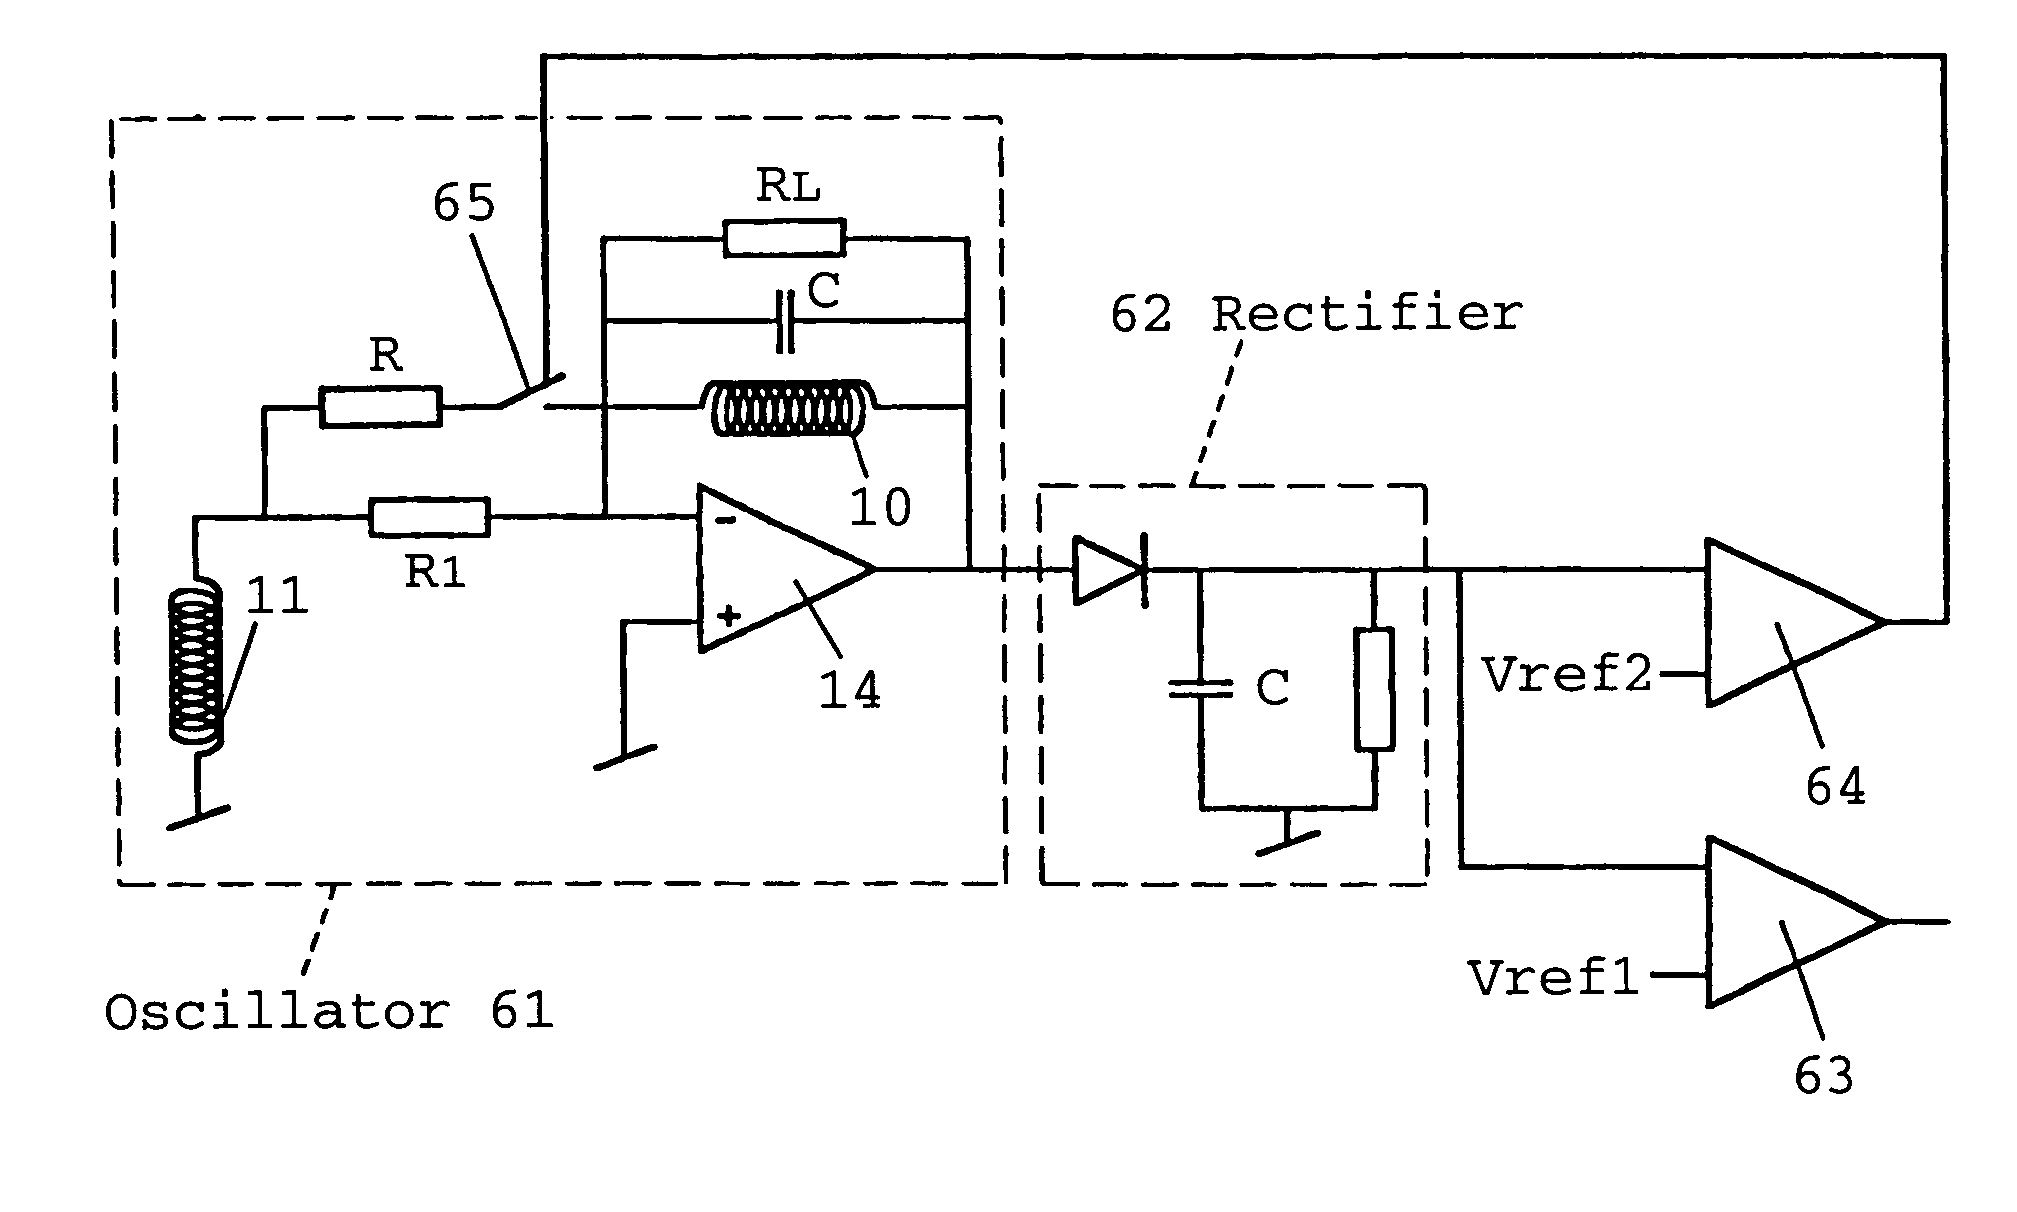 Ifm proximity sensor wiring diagram